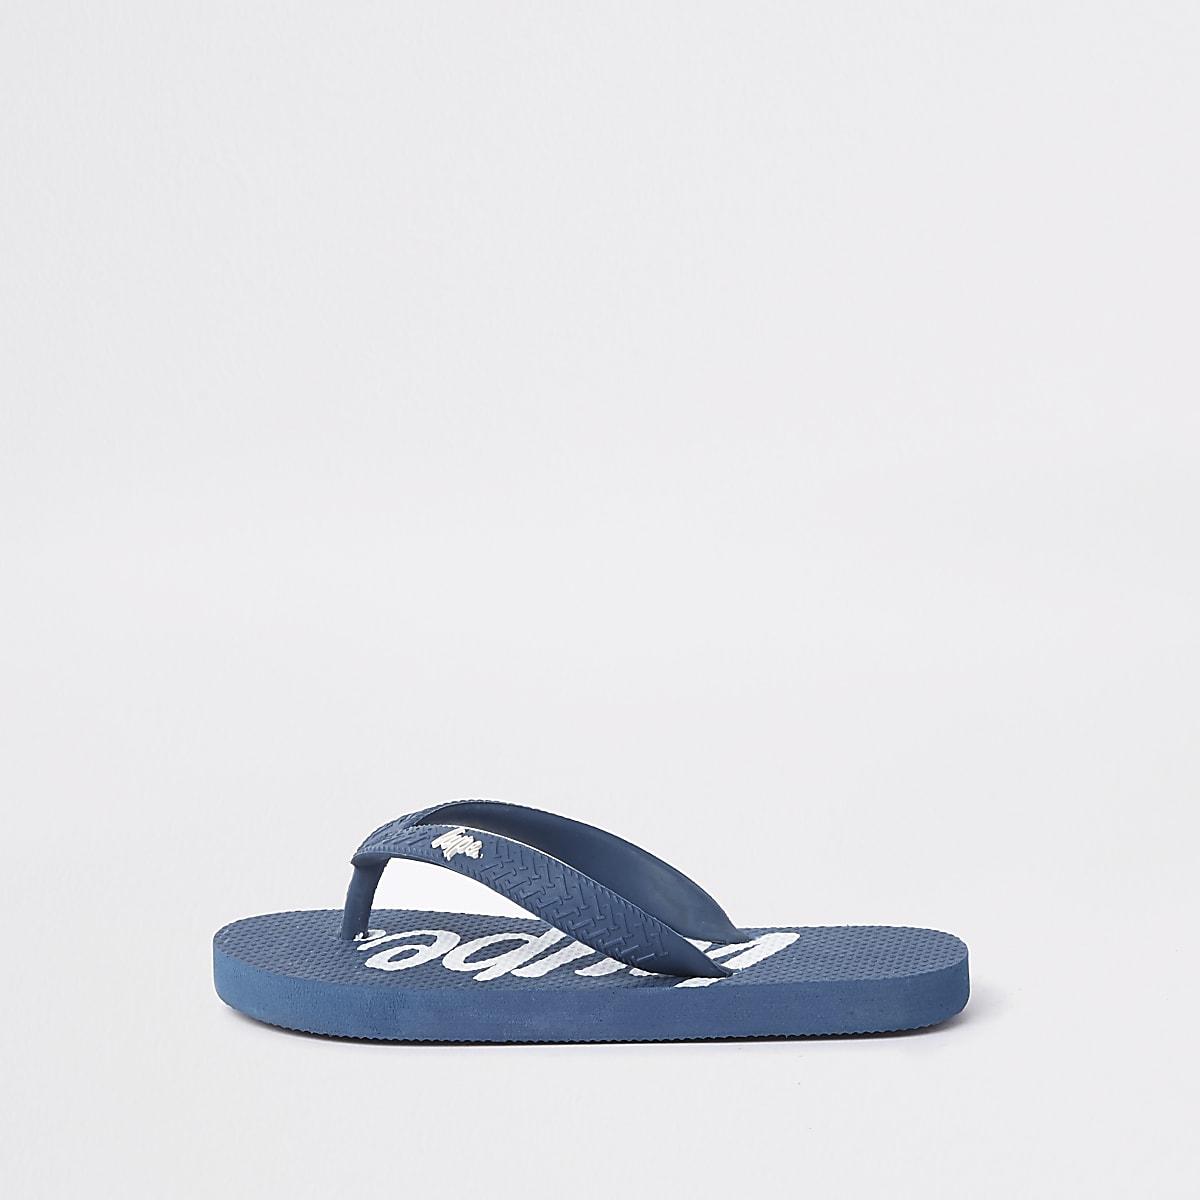 Hype – Tongs bleu marine pour enfant